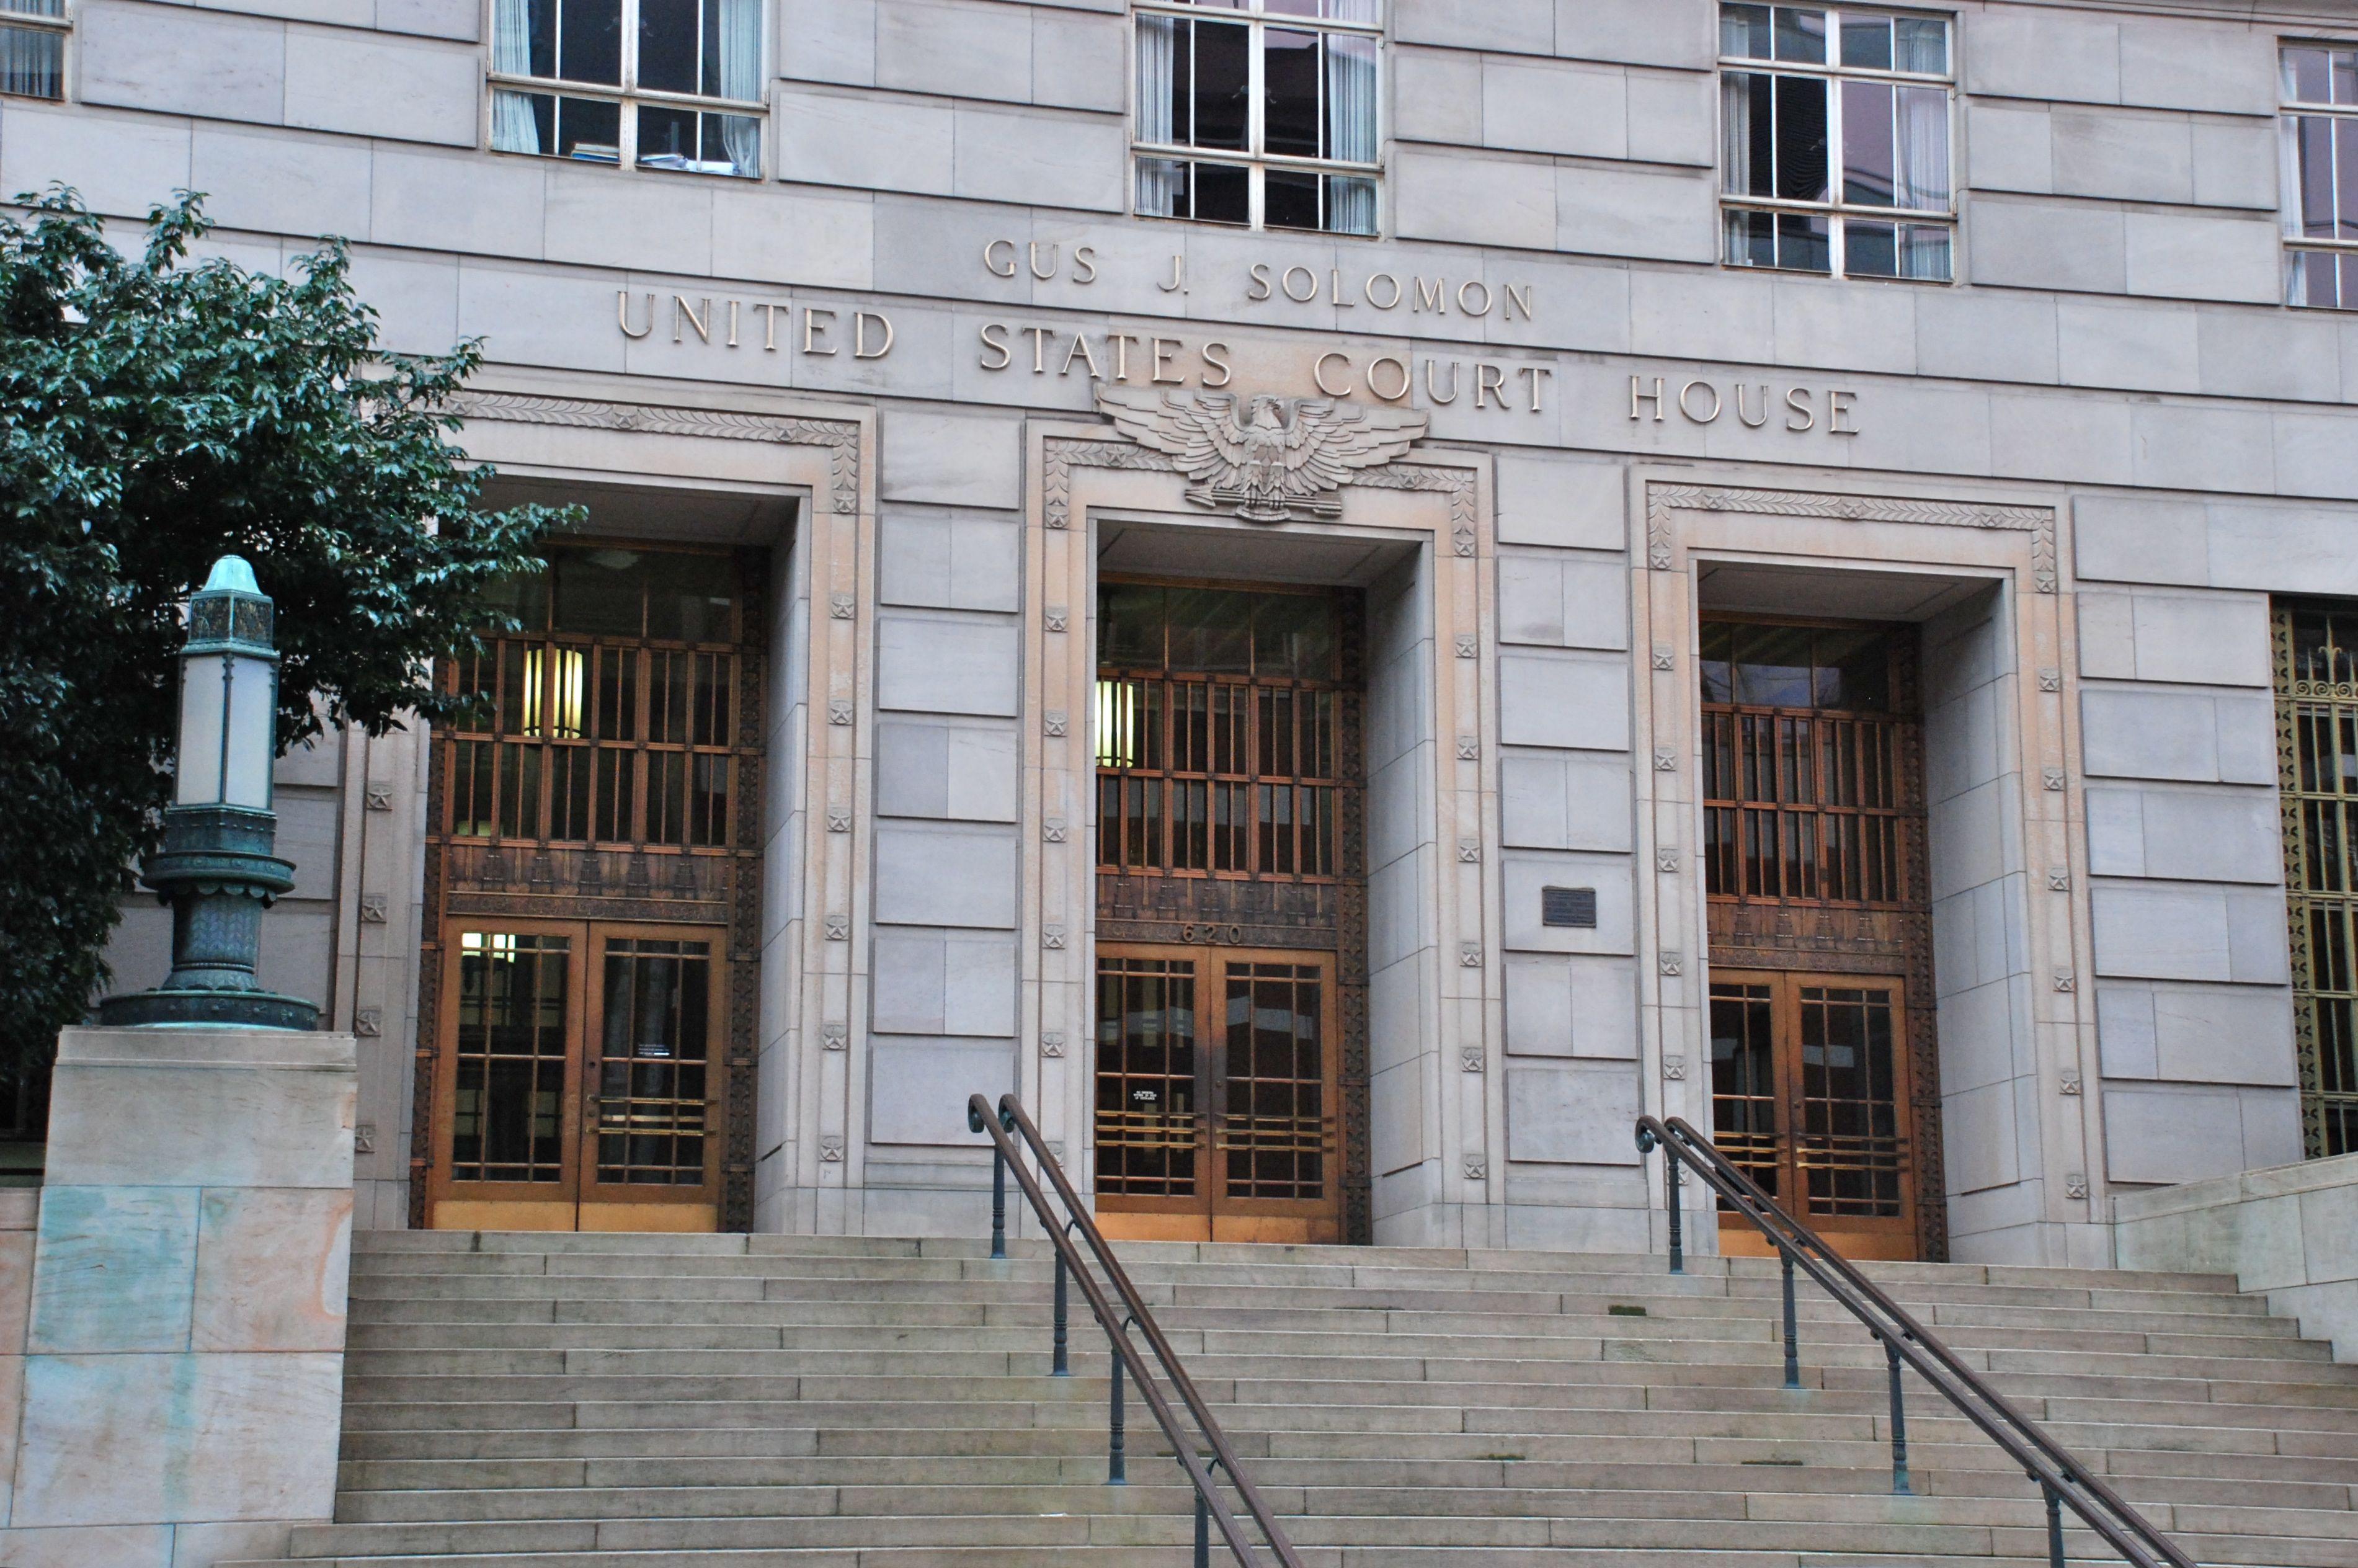 Gus J. Solomon United States Courthouse - Wikipedia